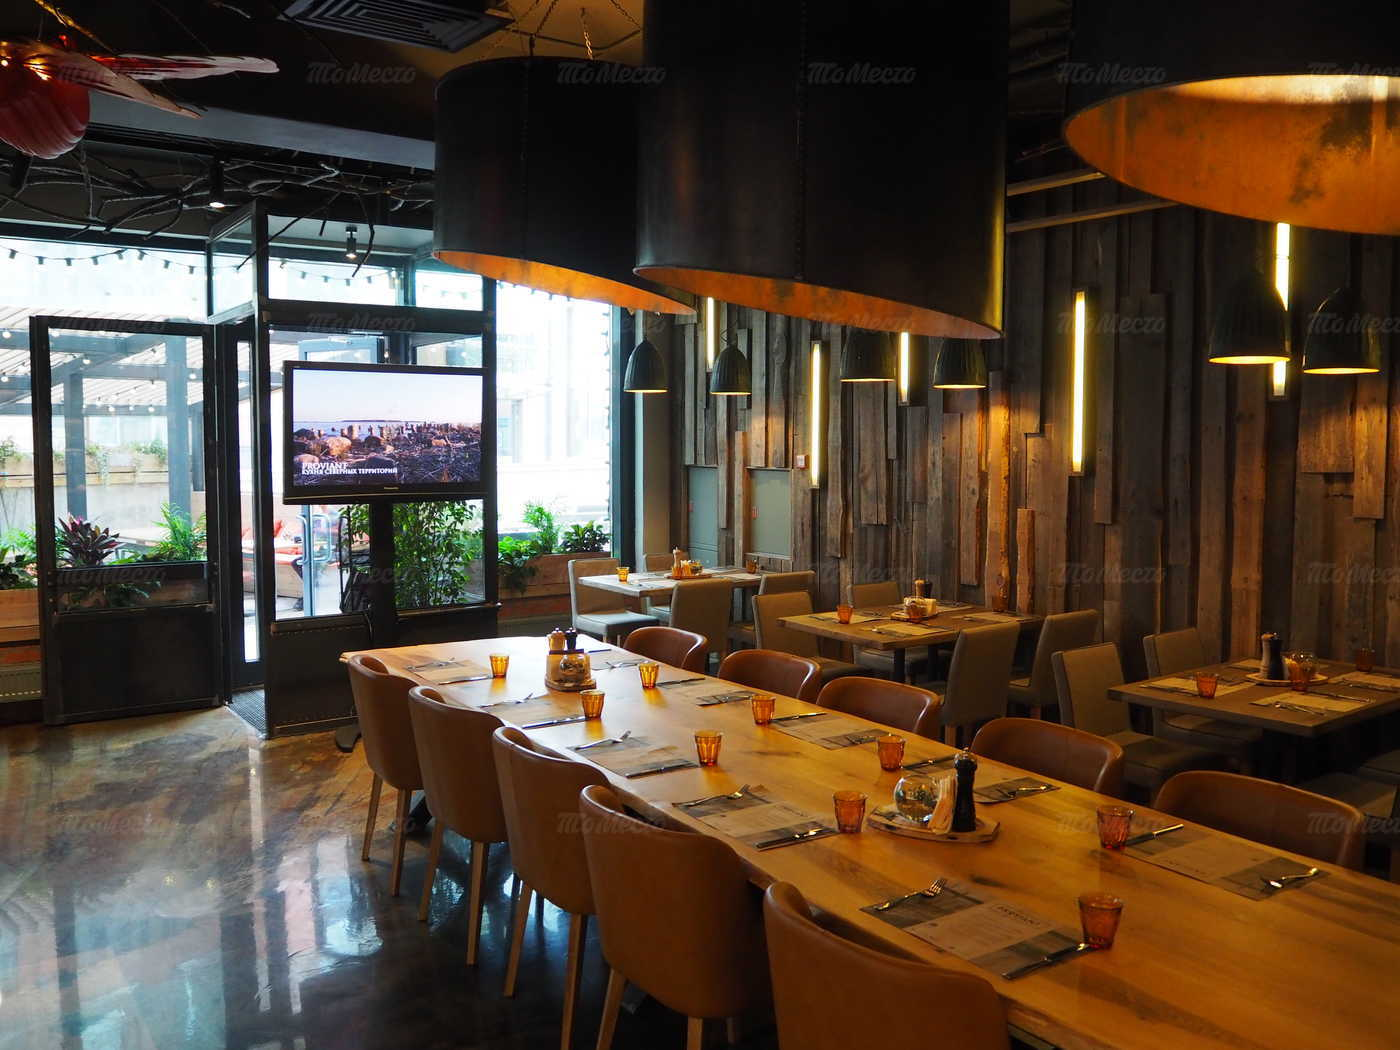 Ресторан Провиант (Proviant) на улице Академика Павлова фото 5